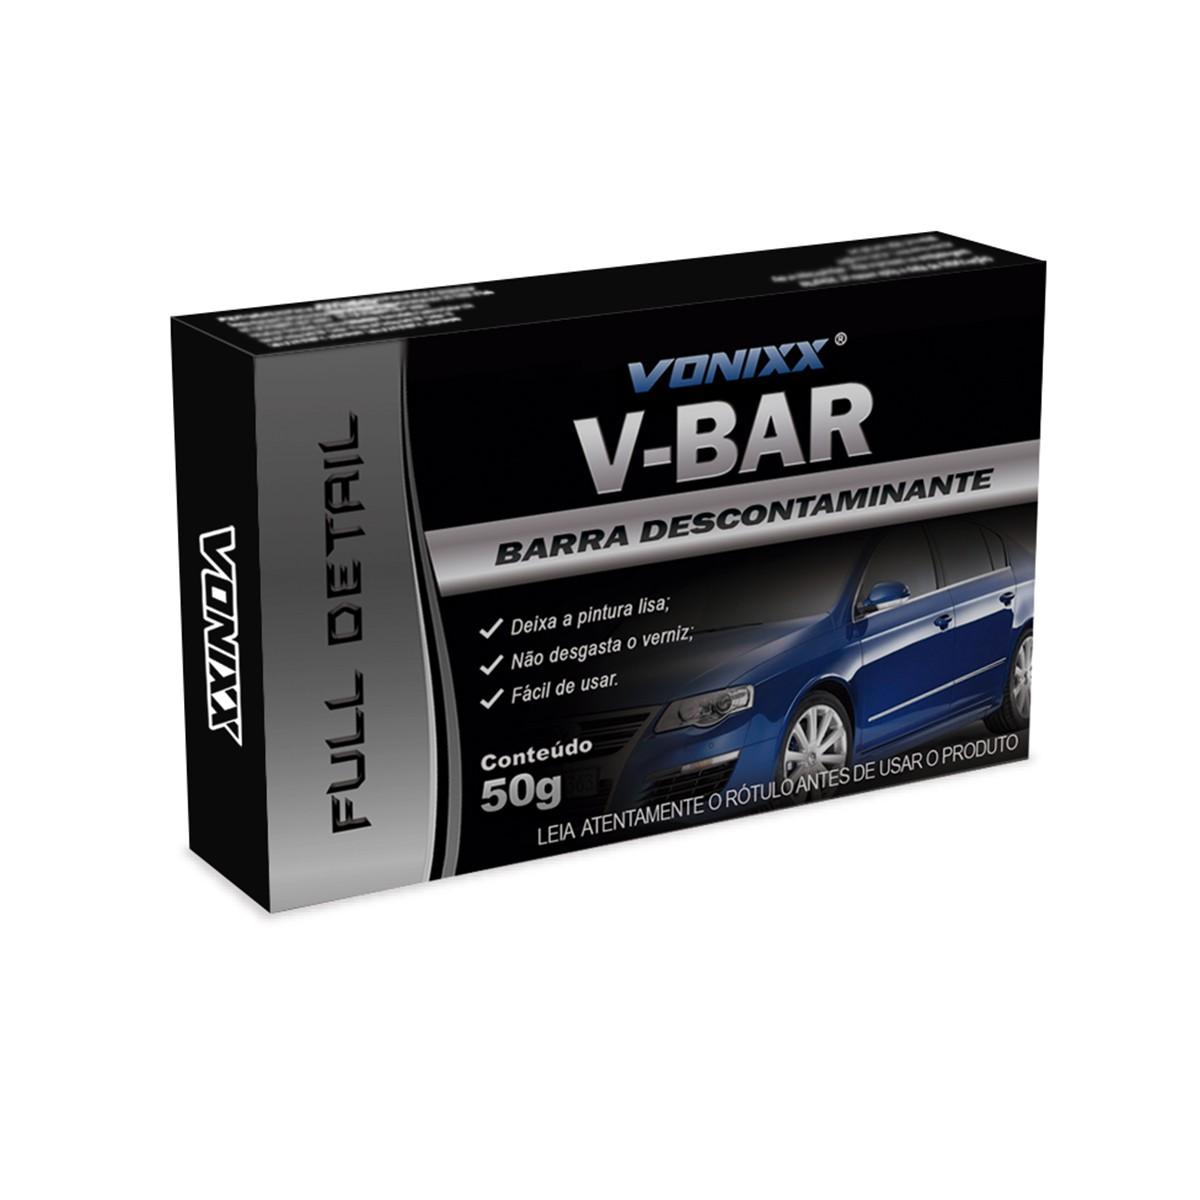 Barra Descontaminante V-Bar 50g Vonixx